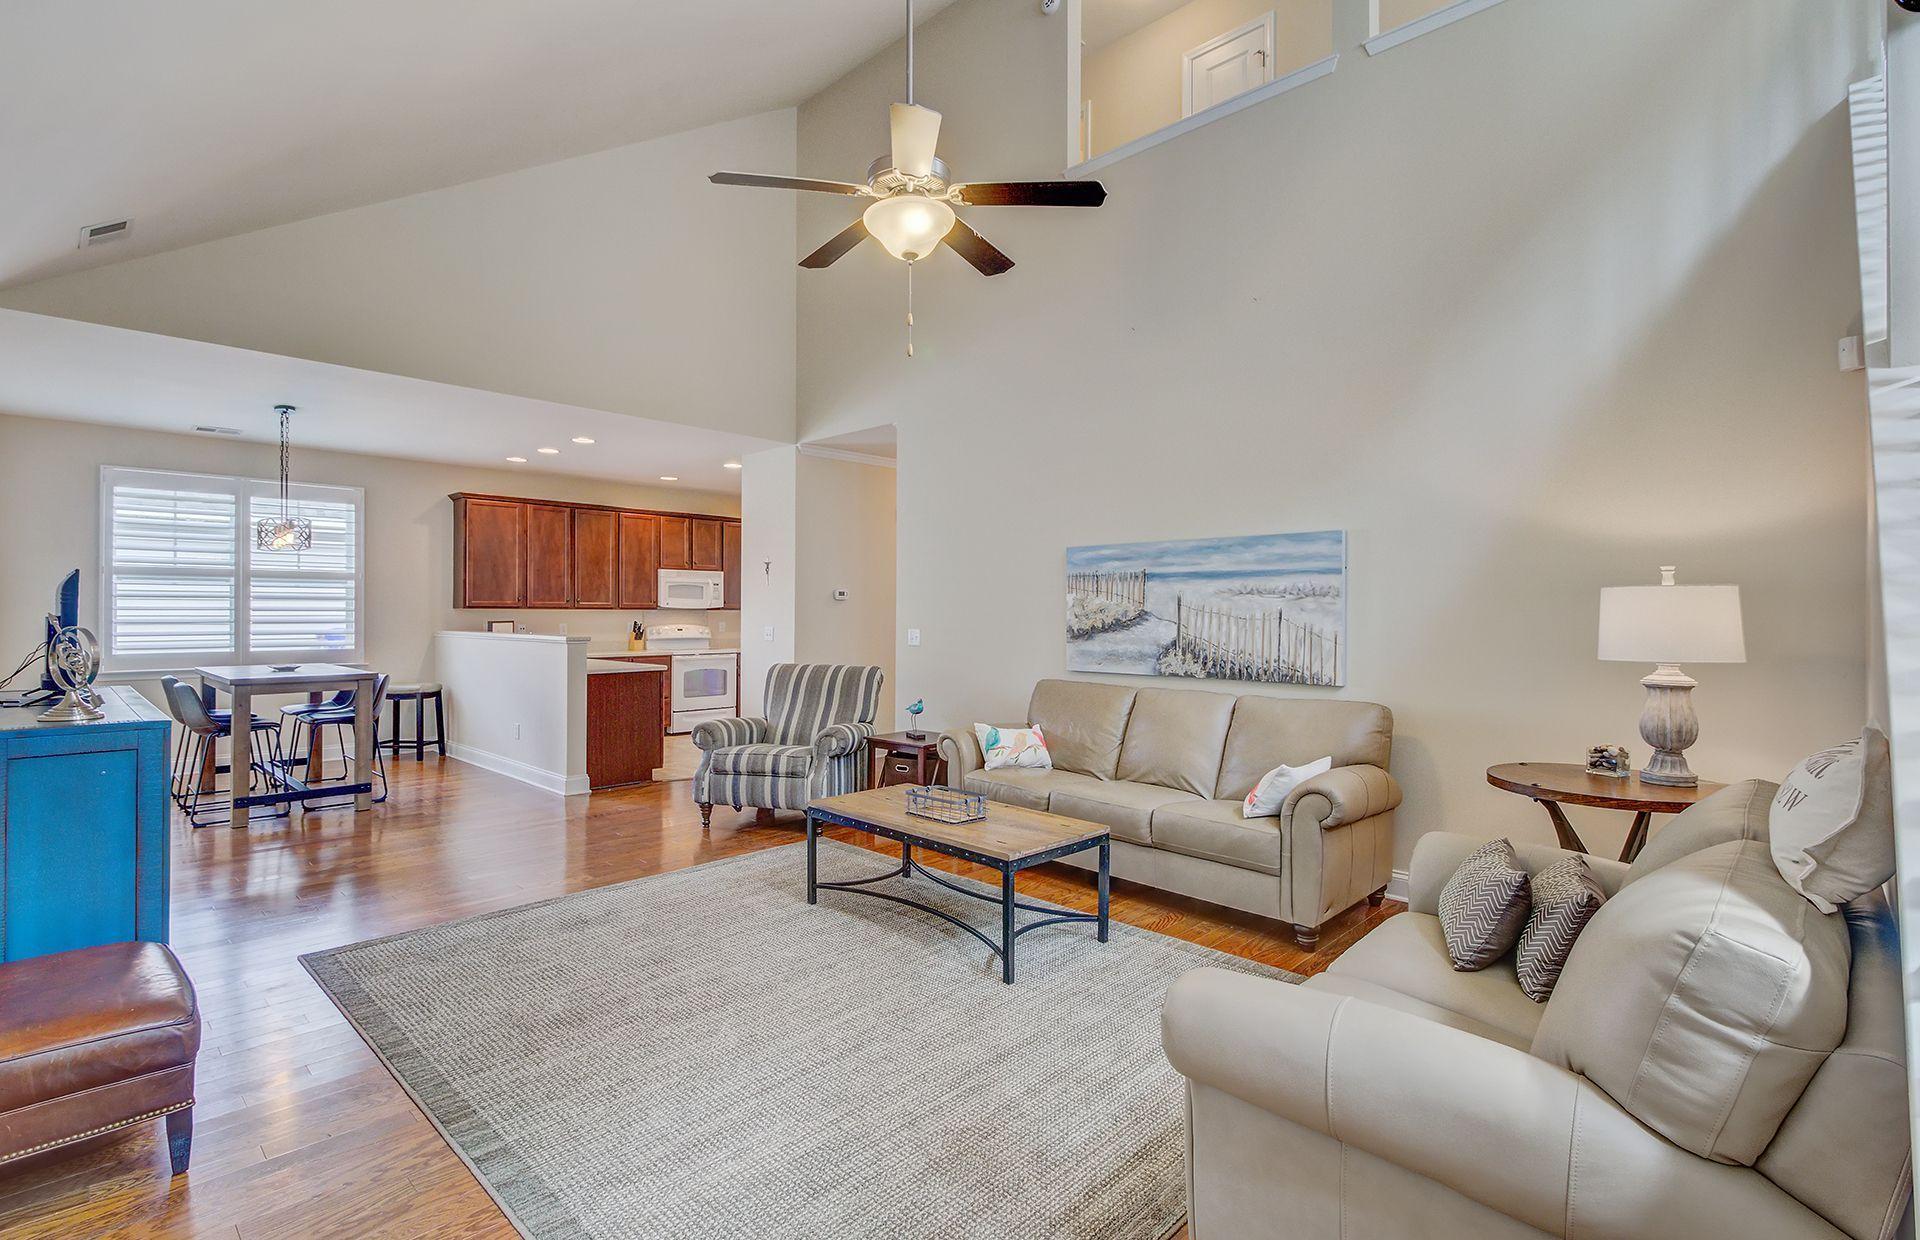 Linnen Place Homes For Sale - 1275 Shingleback, Mount Pleasant, SC - 24